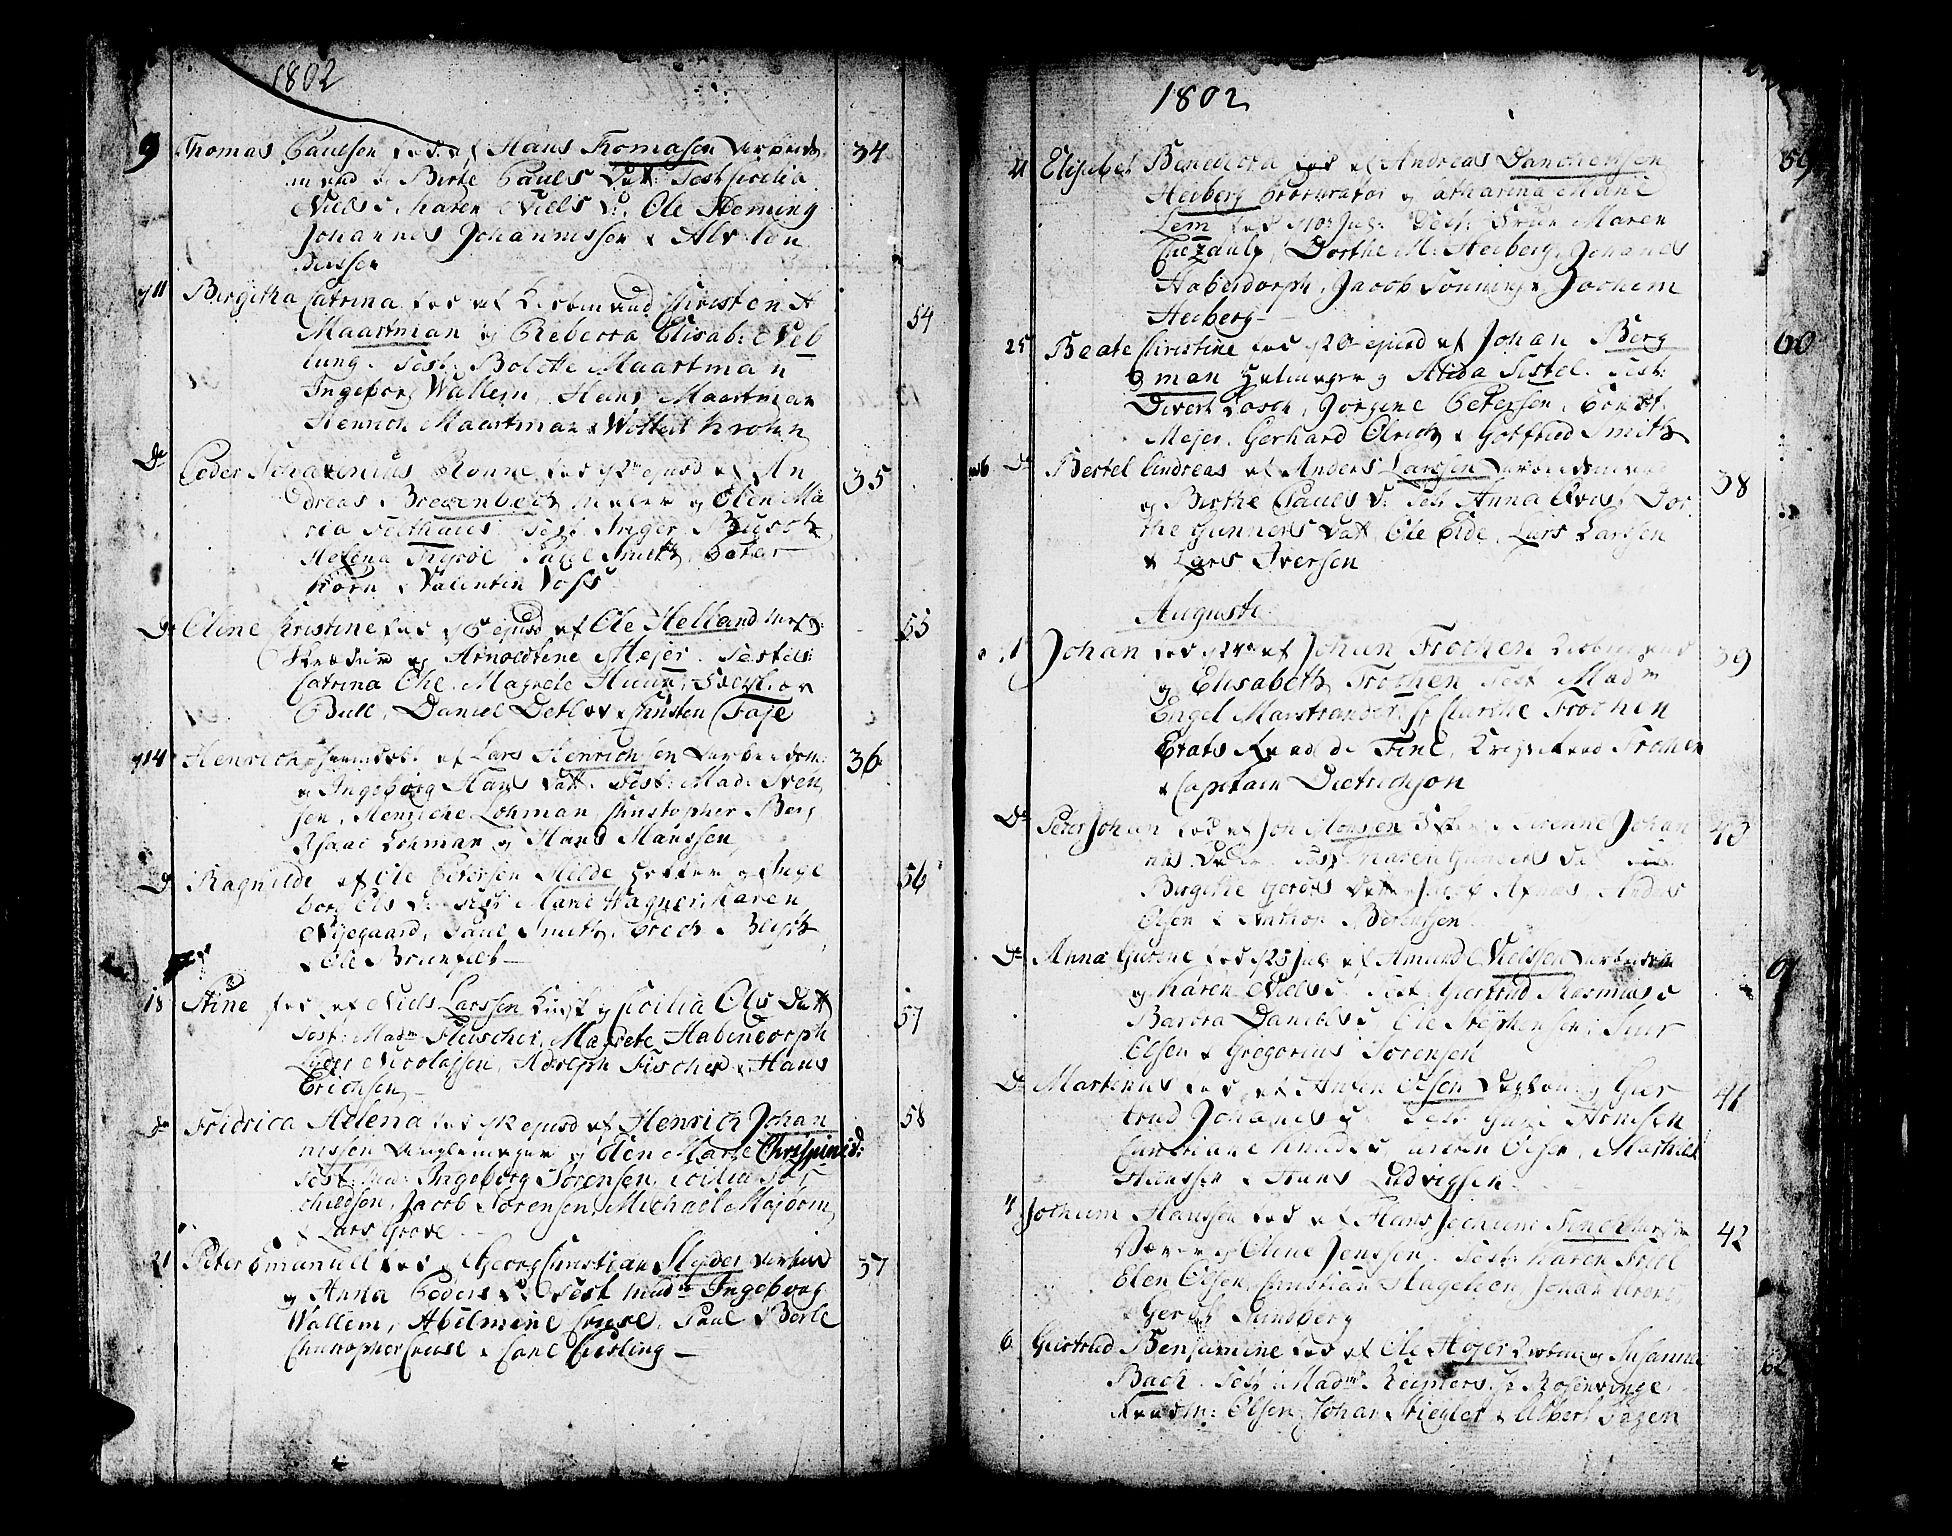 SAB, Domkirken sokneprestembete, H/Haa/L0004: Parish register (official) no. A 4, 1763-1820, p. 278-279